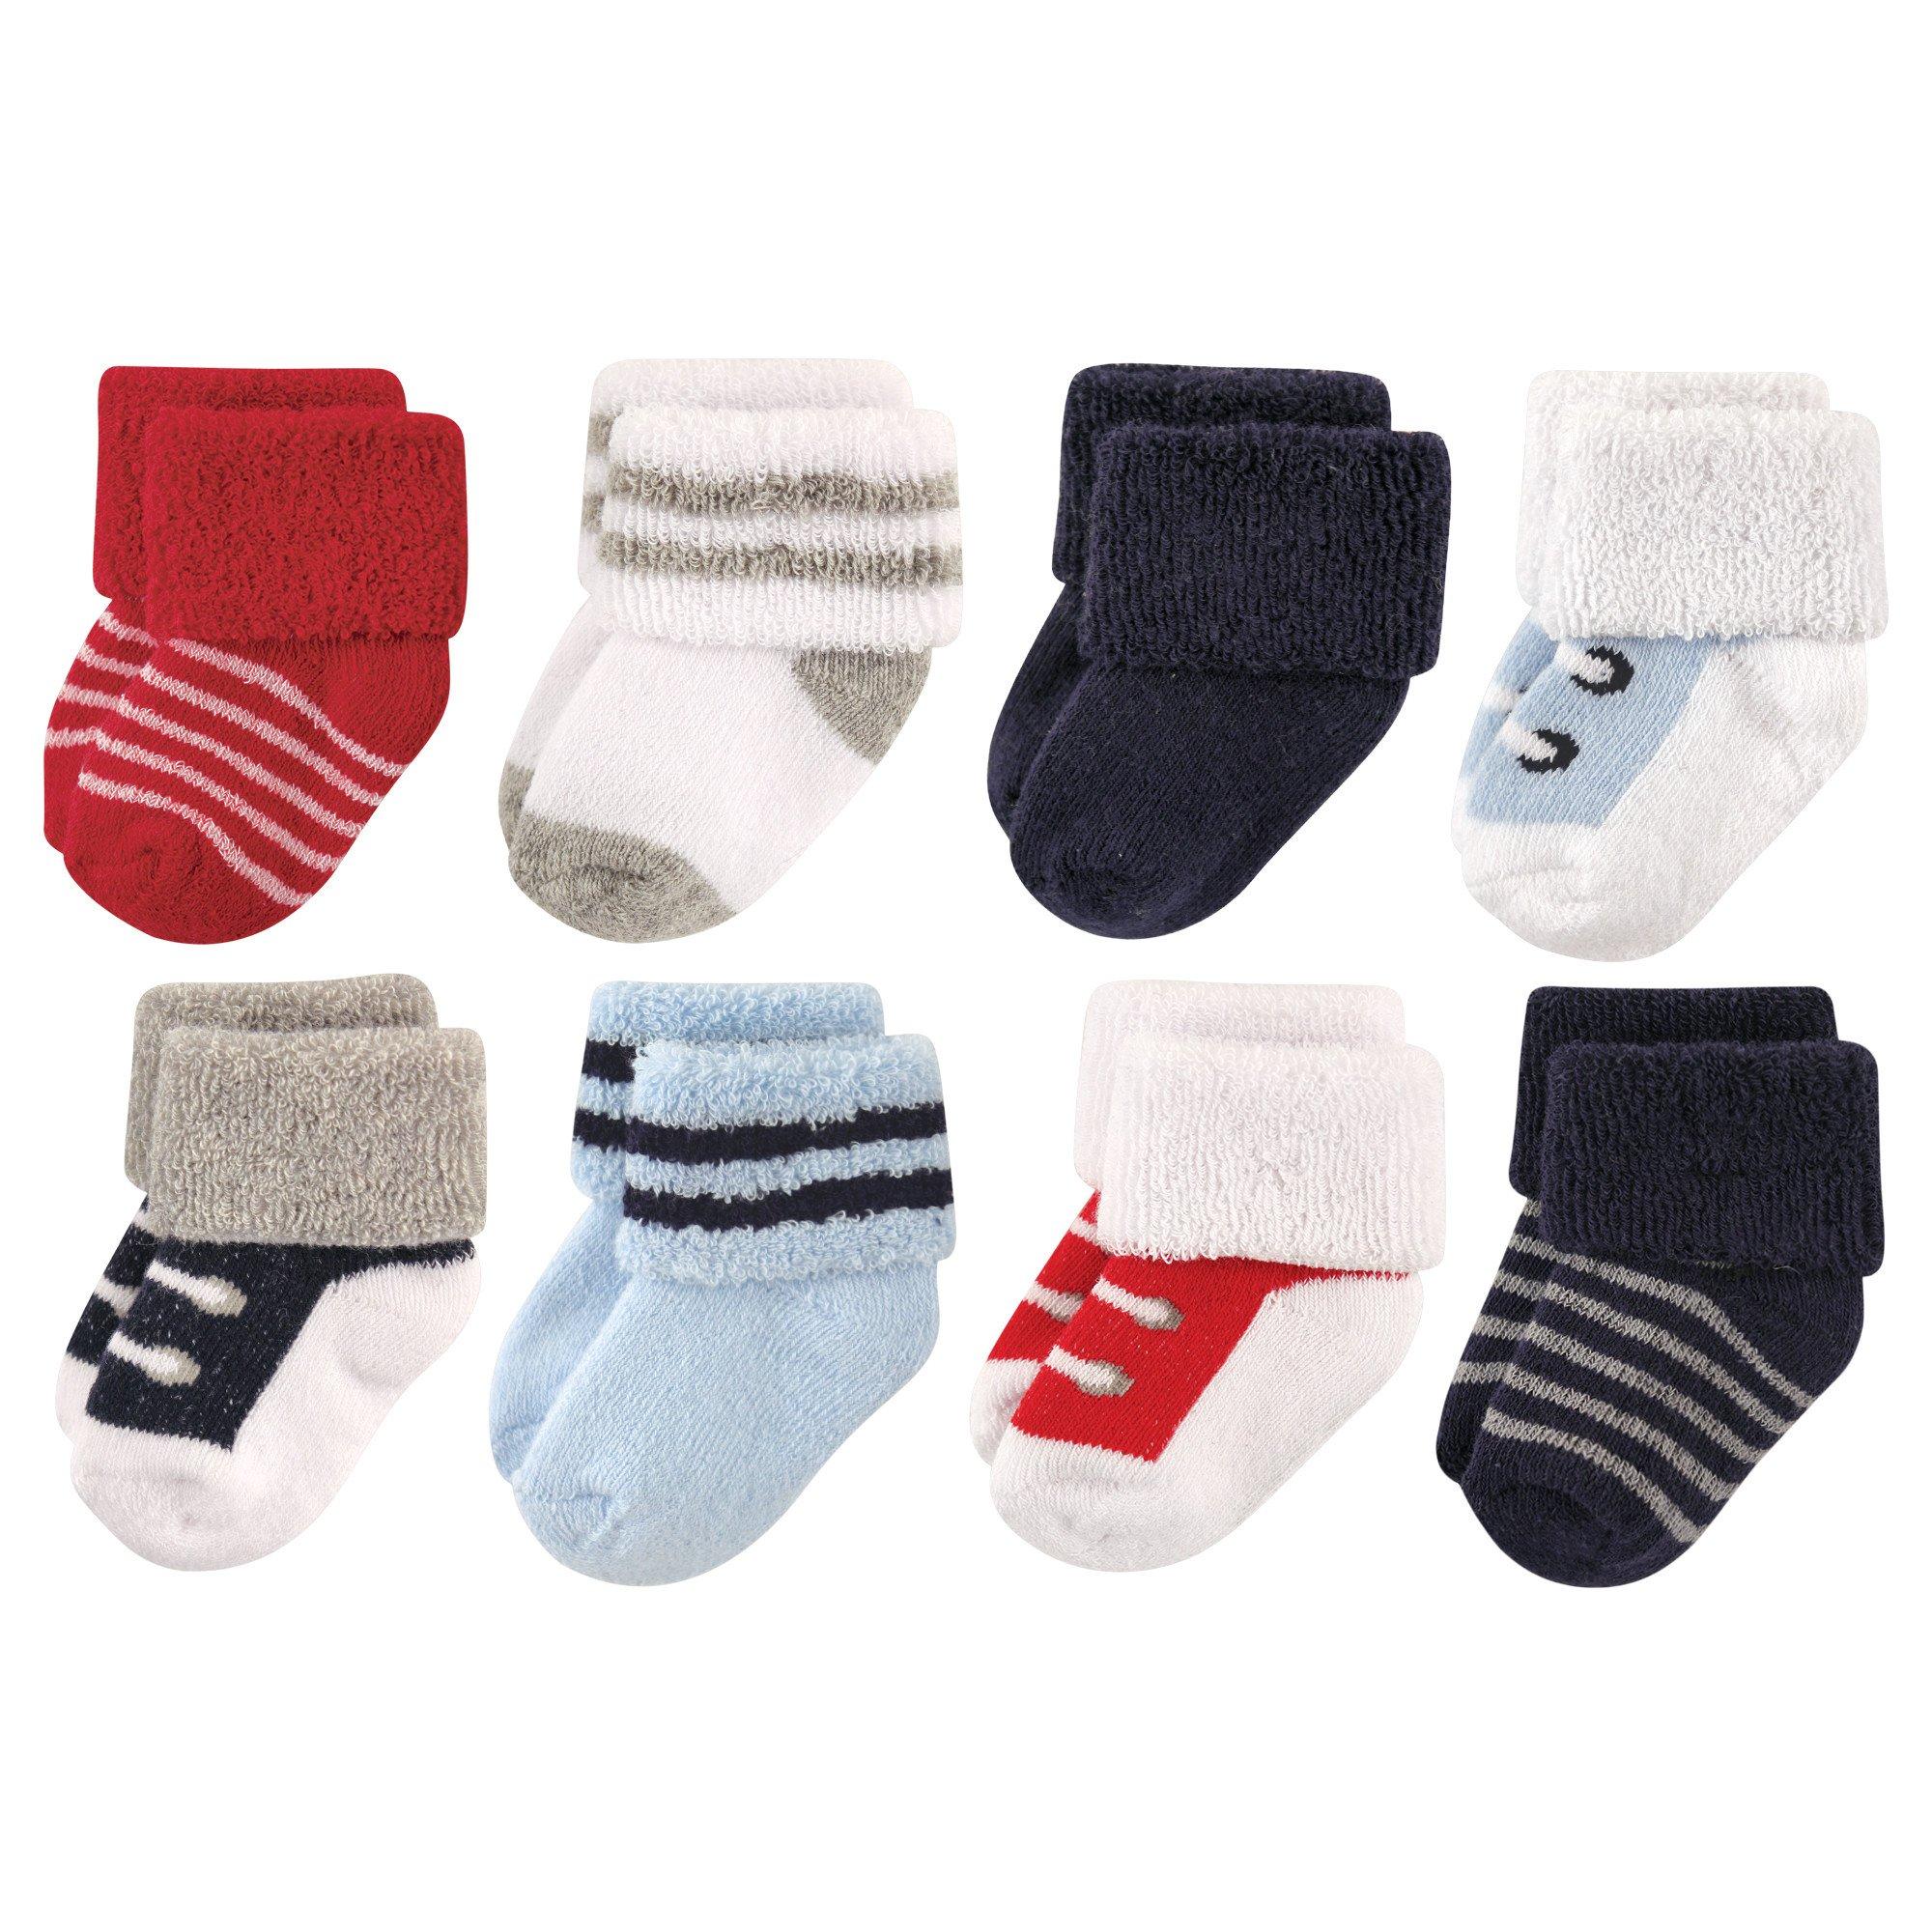 Luvable Friends Unisex Baby Socks, Red/Navy Sneaker